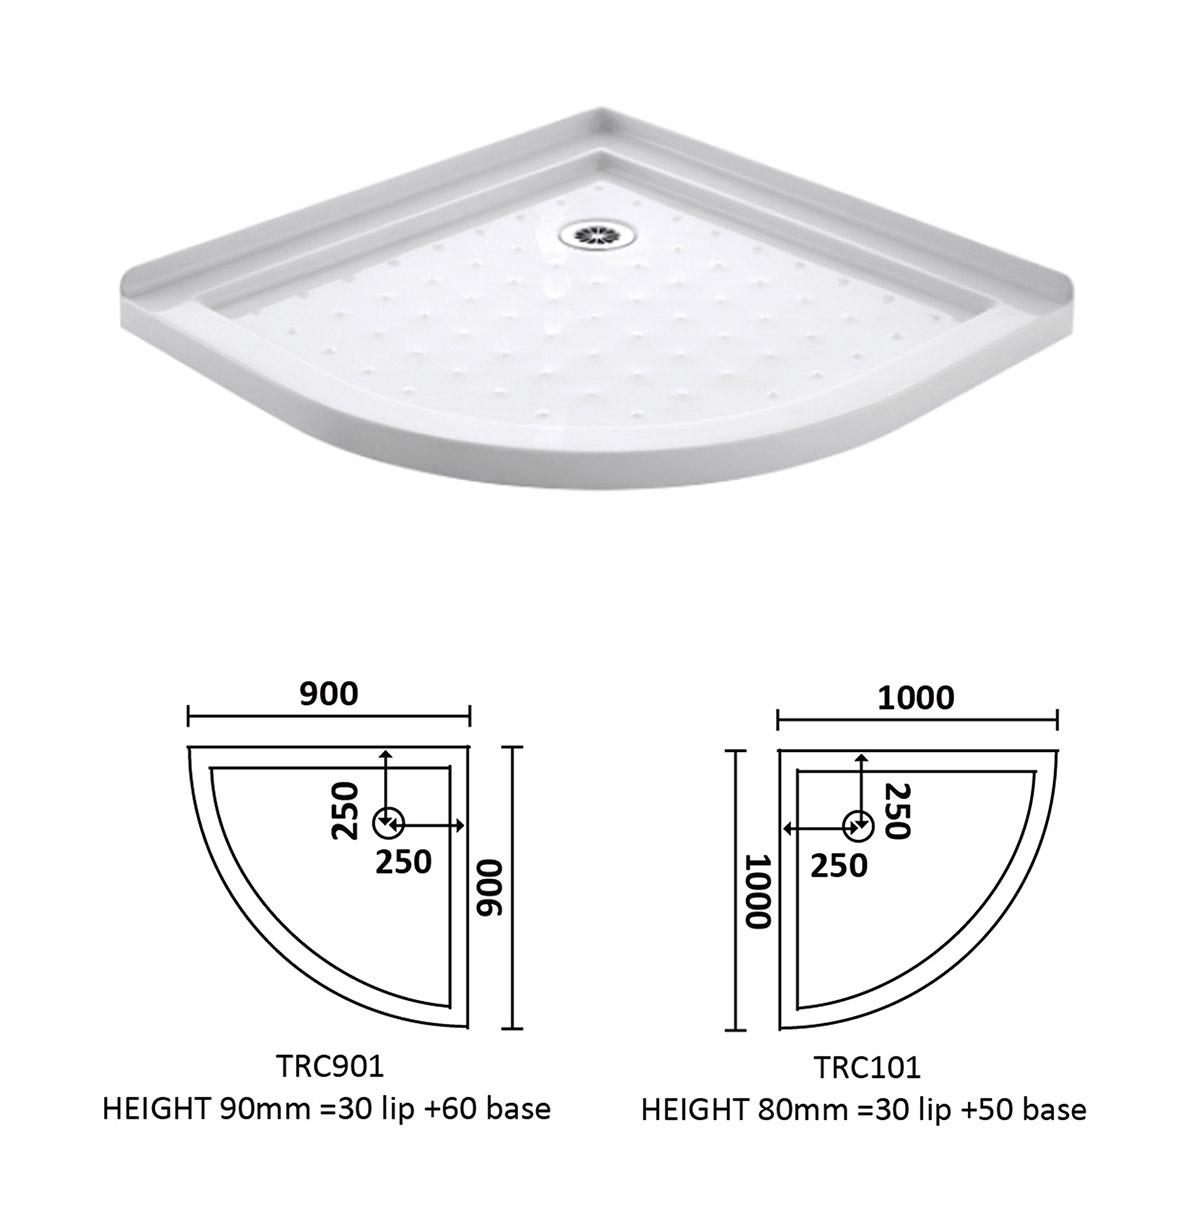 hight resolution of corner waste arc shower tray 900 900